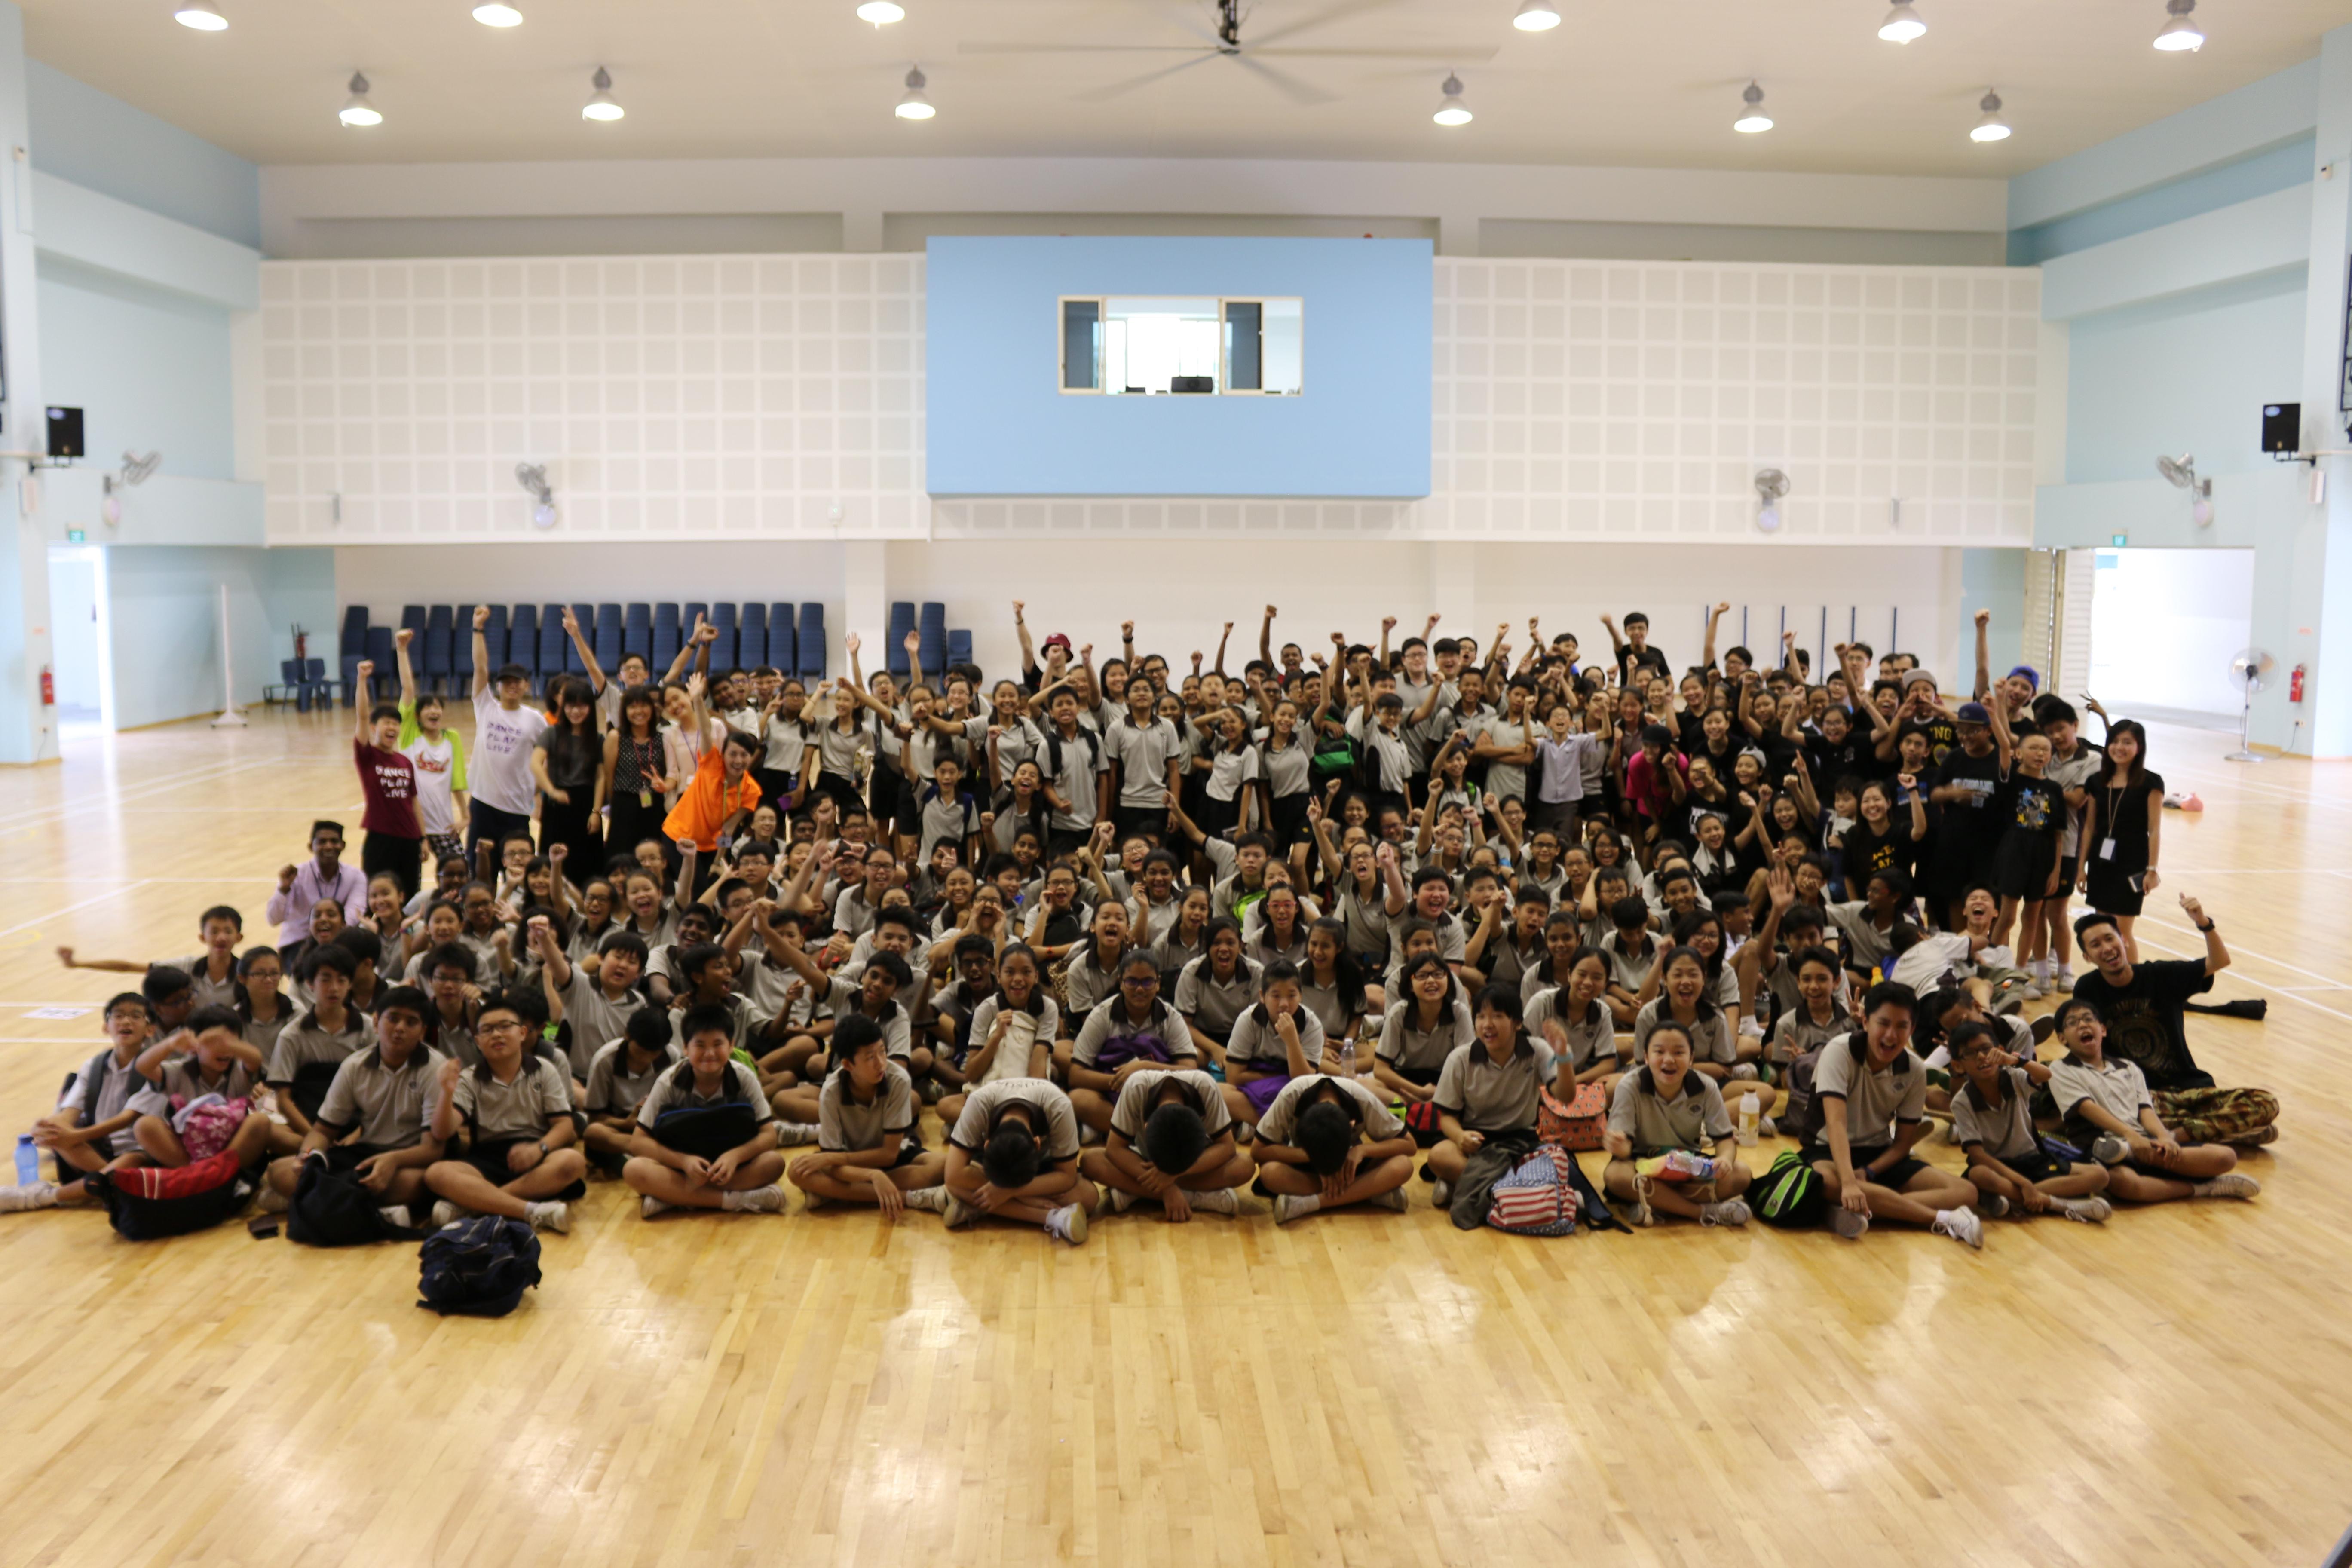 YuHua Secondary School Mass Dance